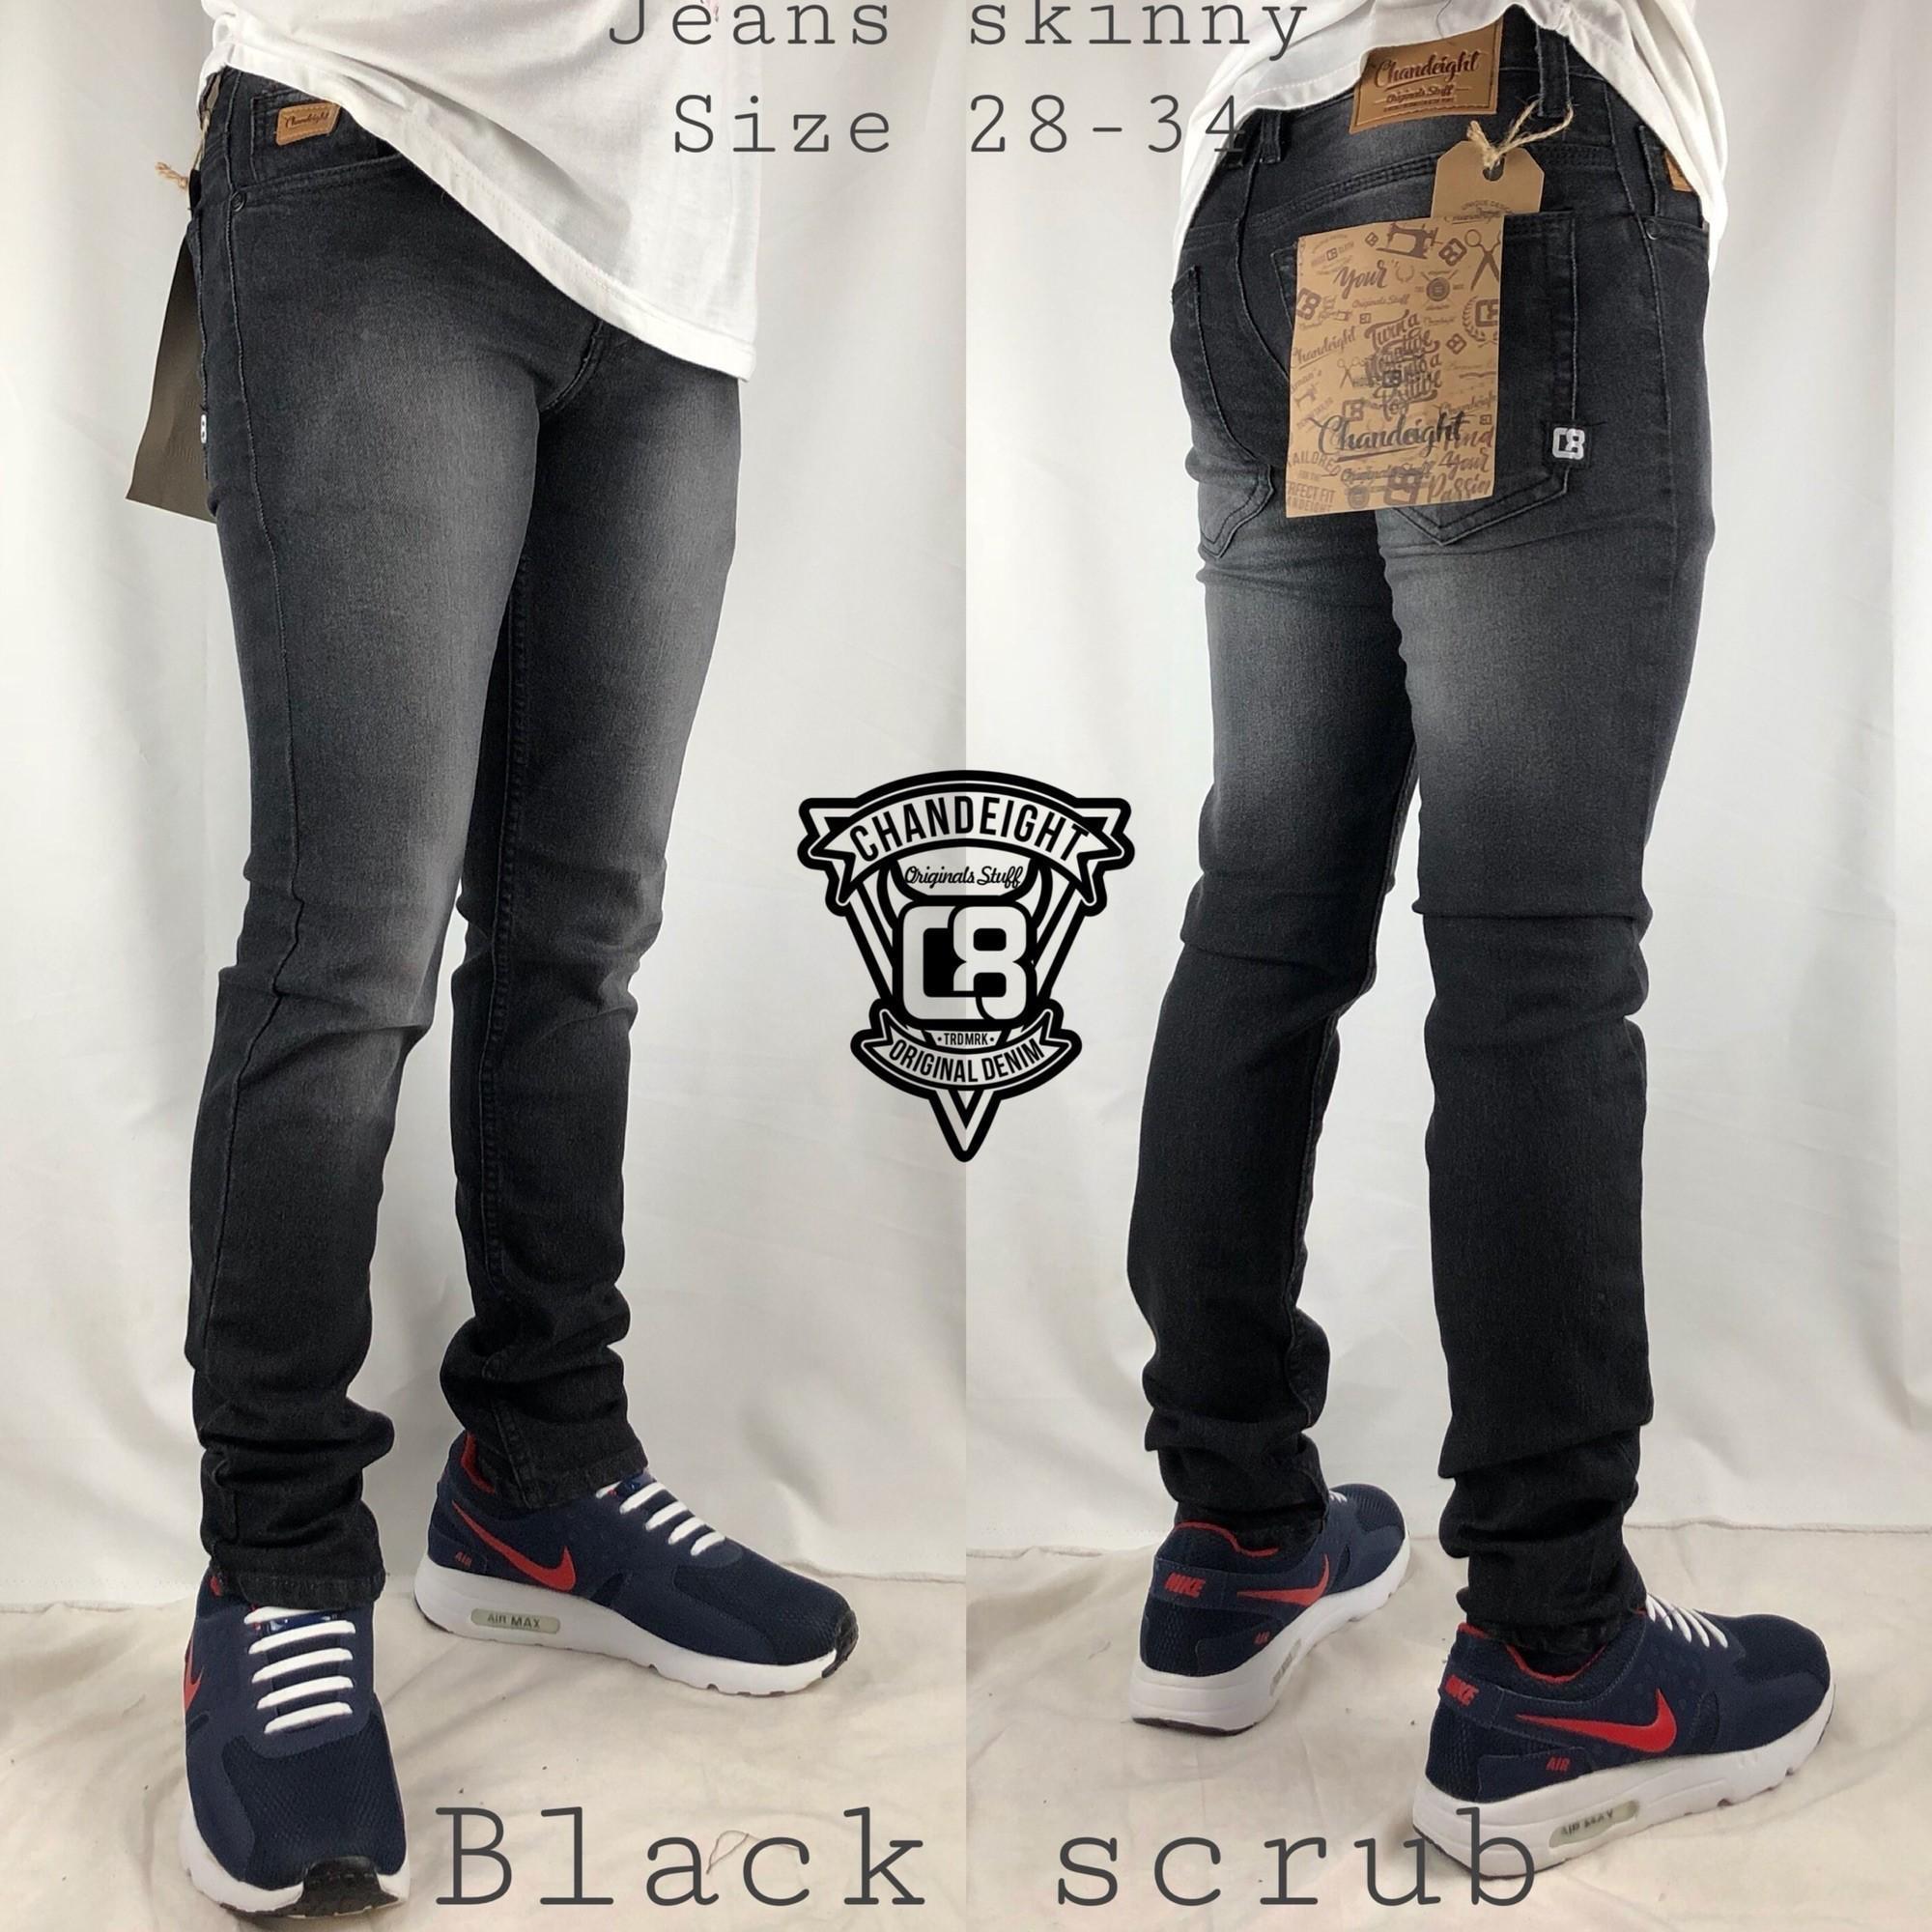 KeepStore-Chandeight Celana jeans skinny / pensil / slimfit pria